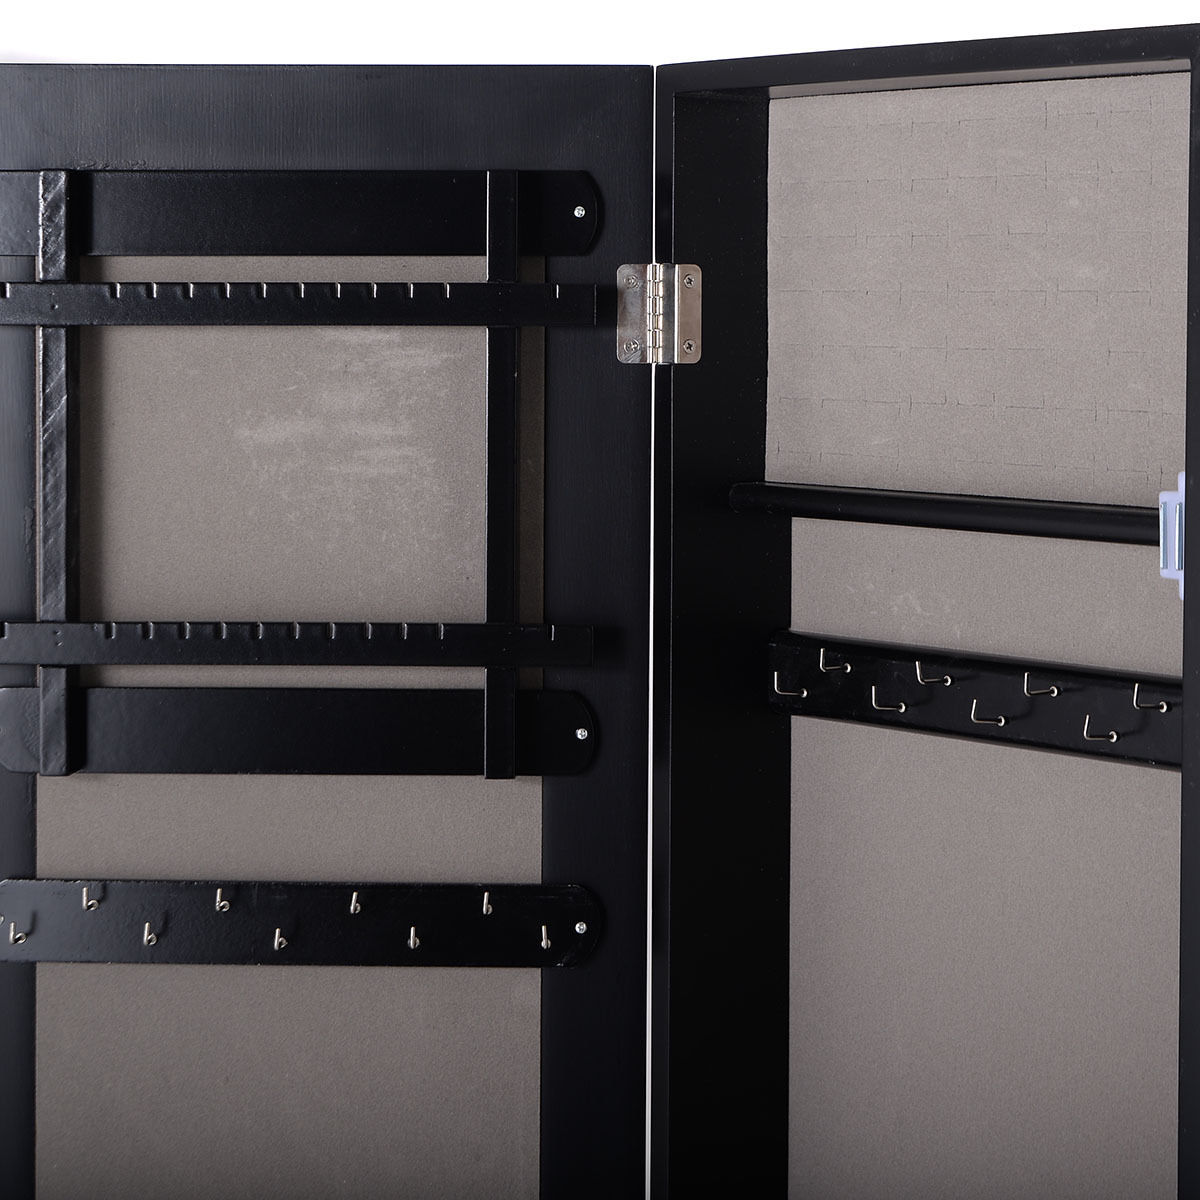 Costway Mirrored Jewelry Cabinet Armoire Mirror Organizer Storage